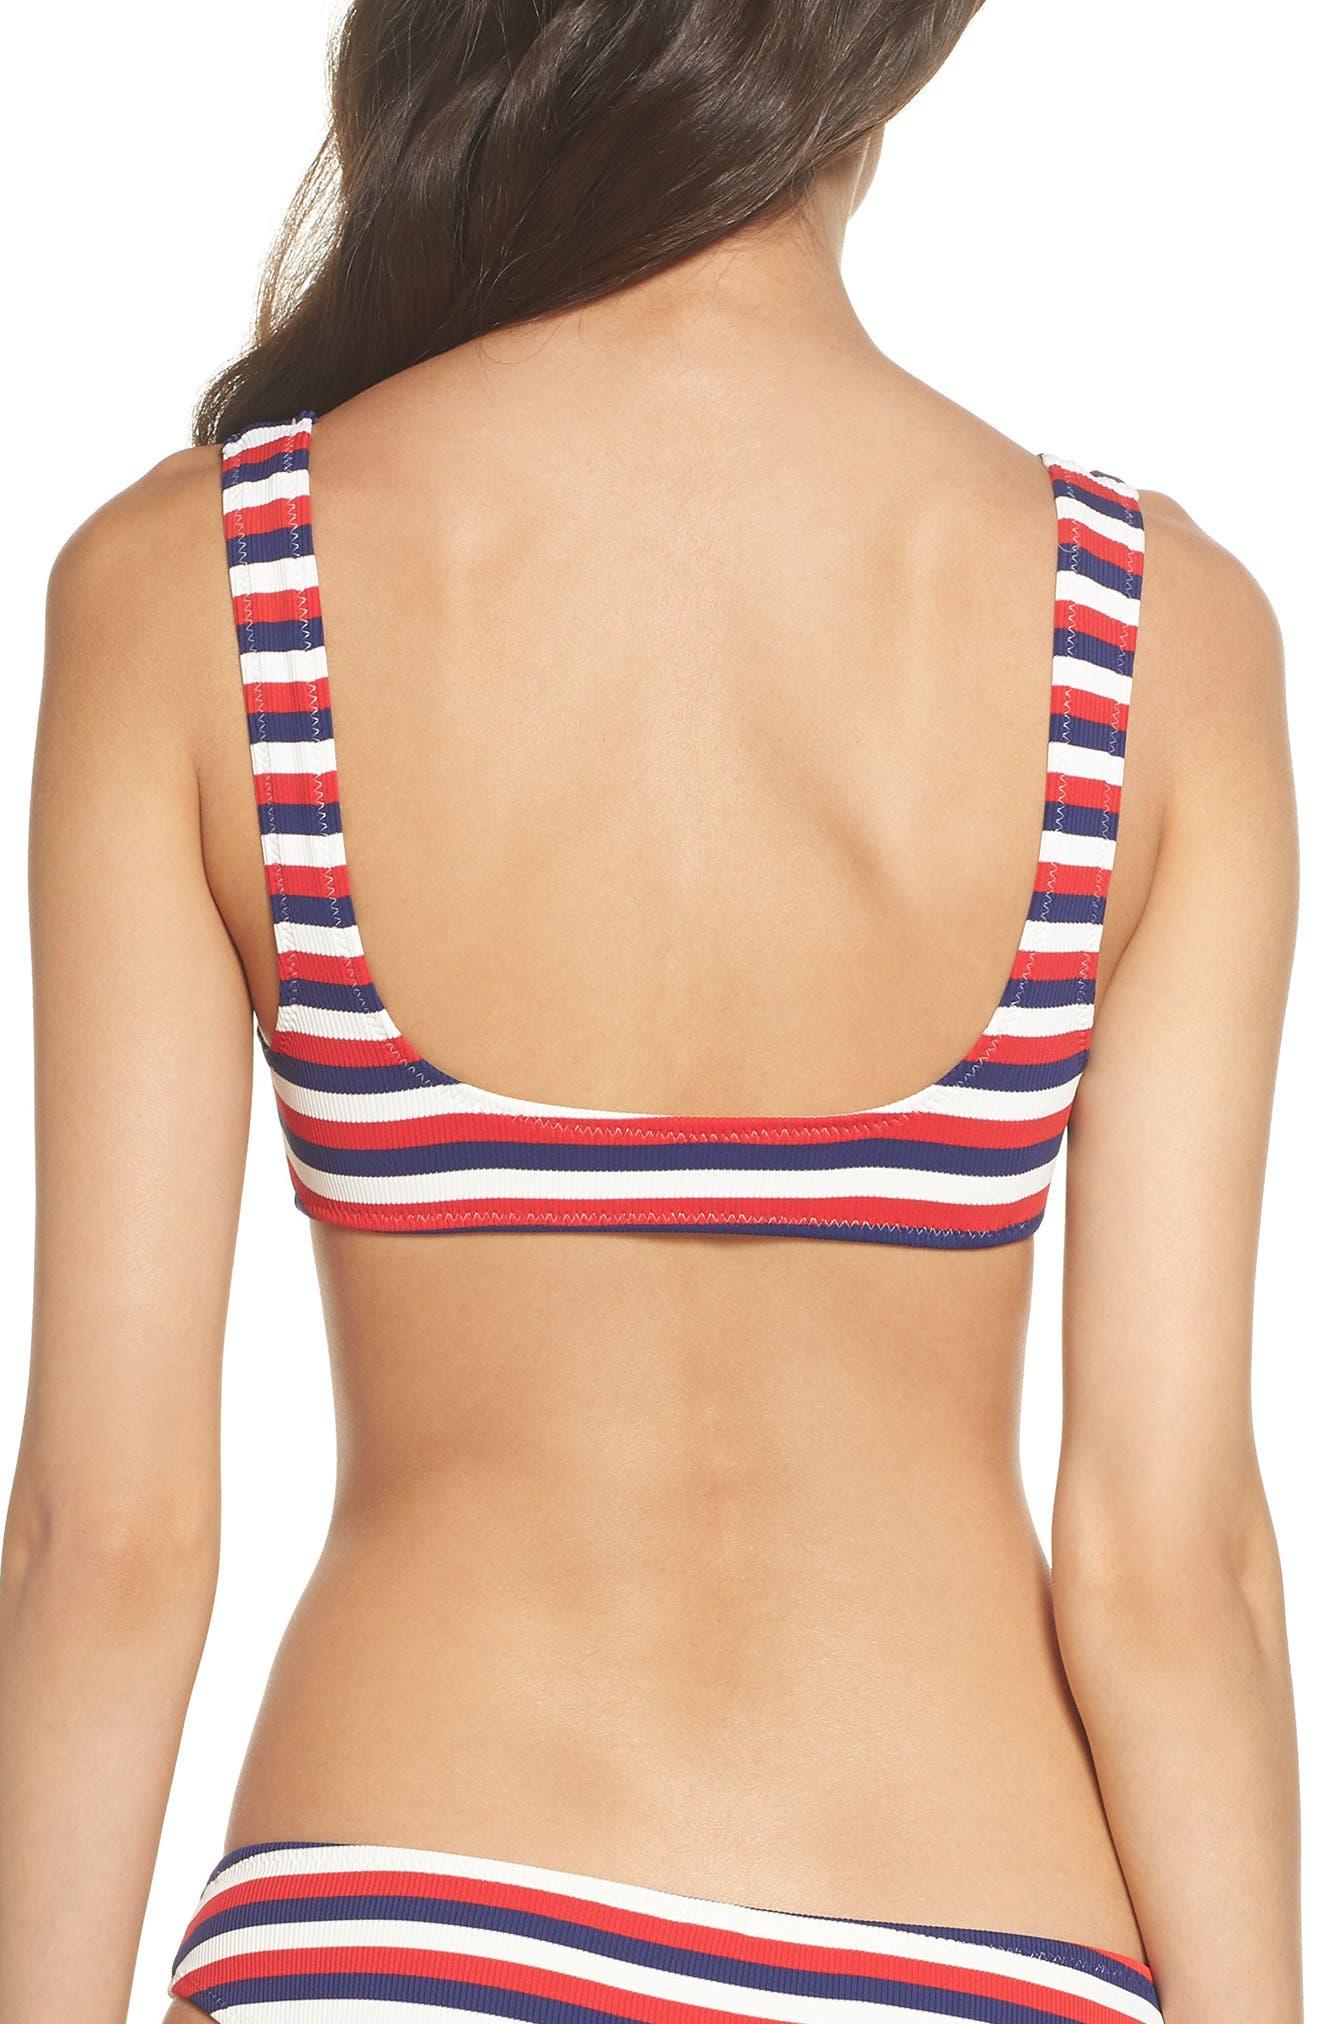 Elle Bikini Top,                             Alternate thumbnail 2, color,                             AMERICAN RIB